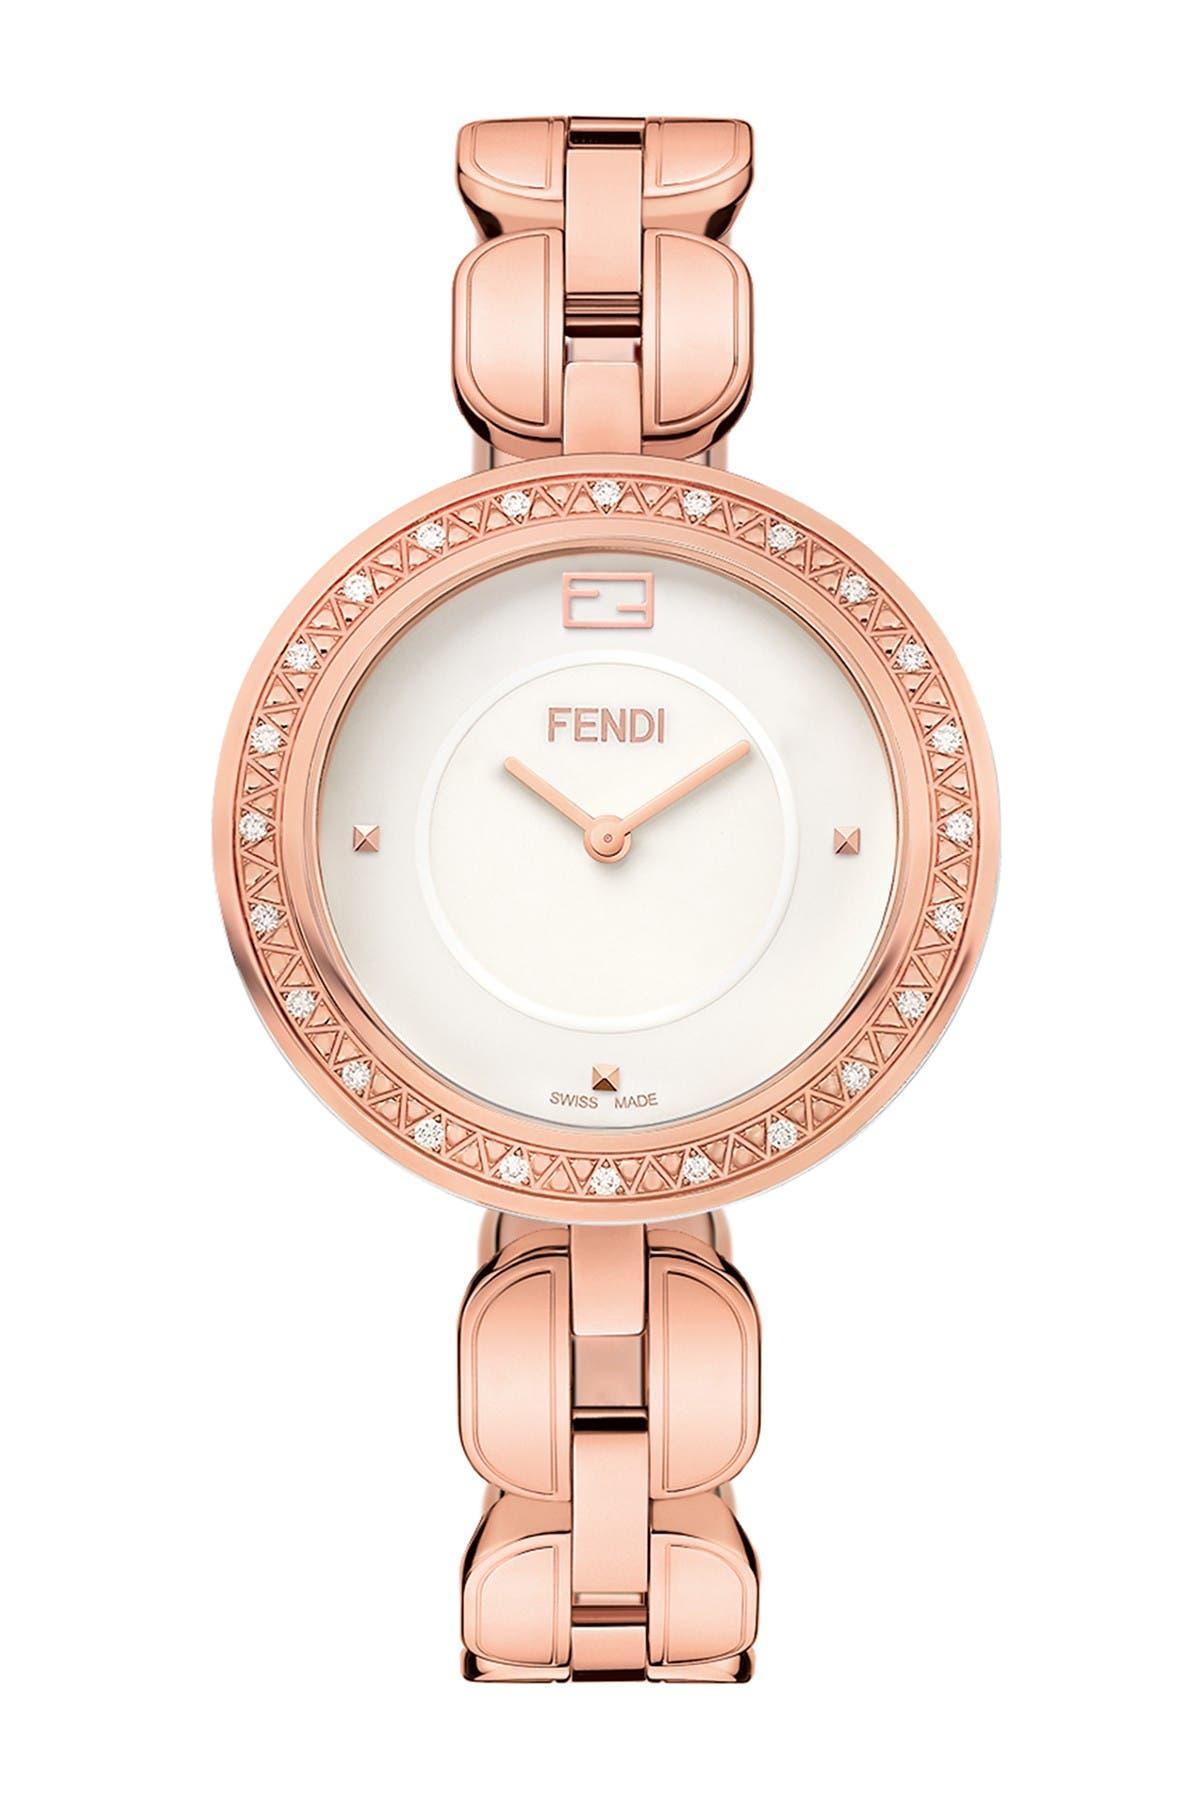 Image of FENDI Women's Fendi My Way Quartz Bracelet Watch, 36mm